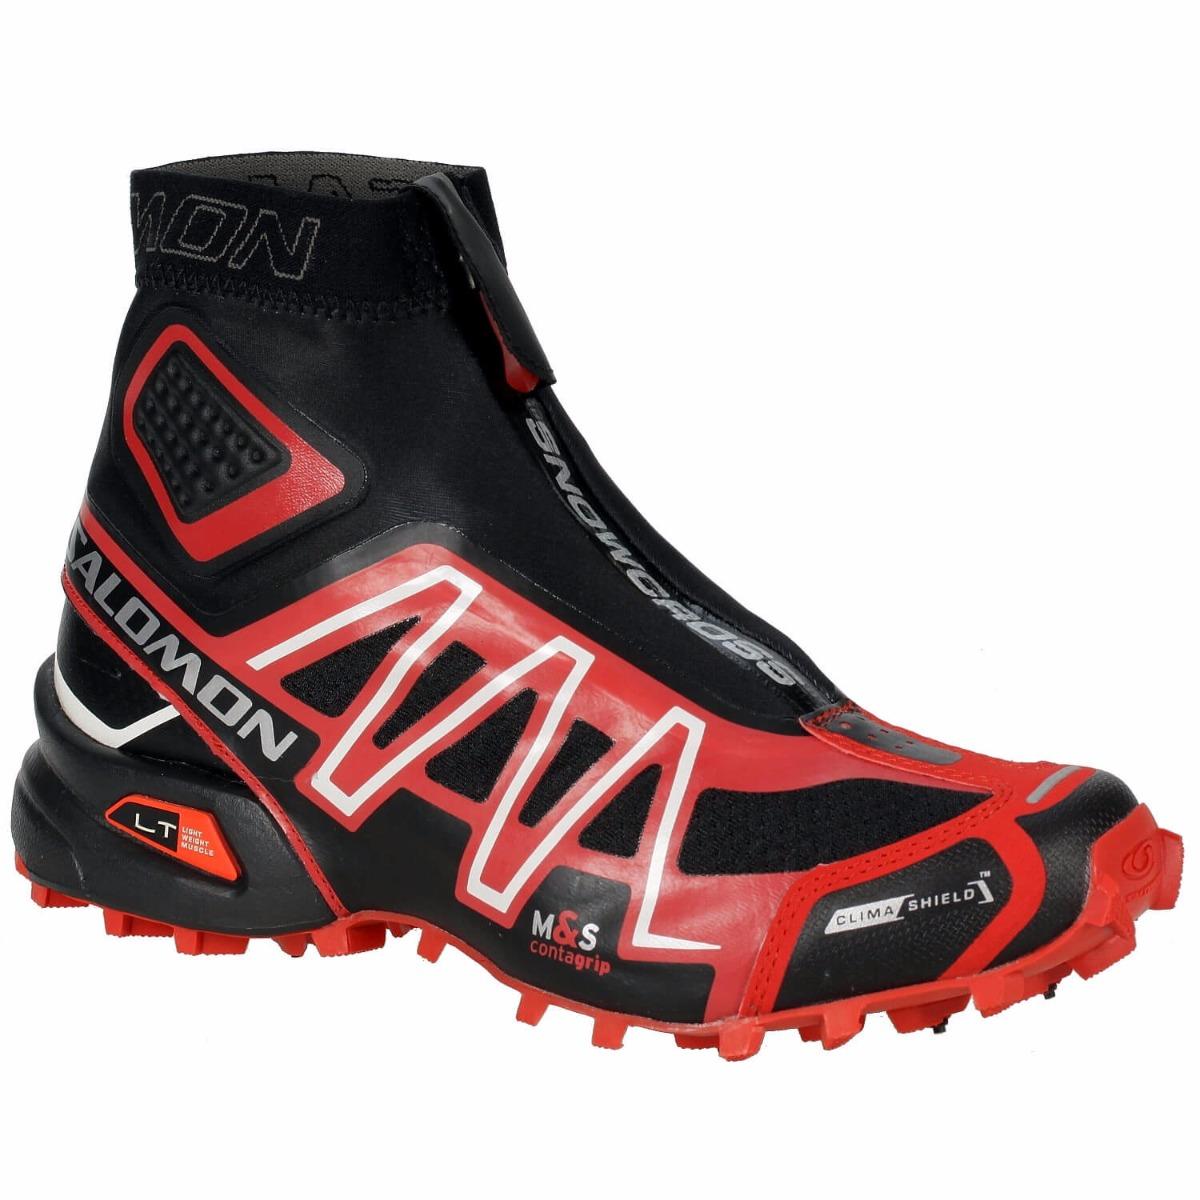 new arrival 0375f d2f95 Salomon Snowcross CS Men's Shoes| Trail running